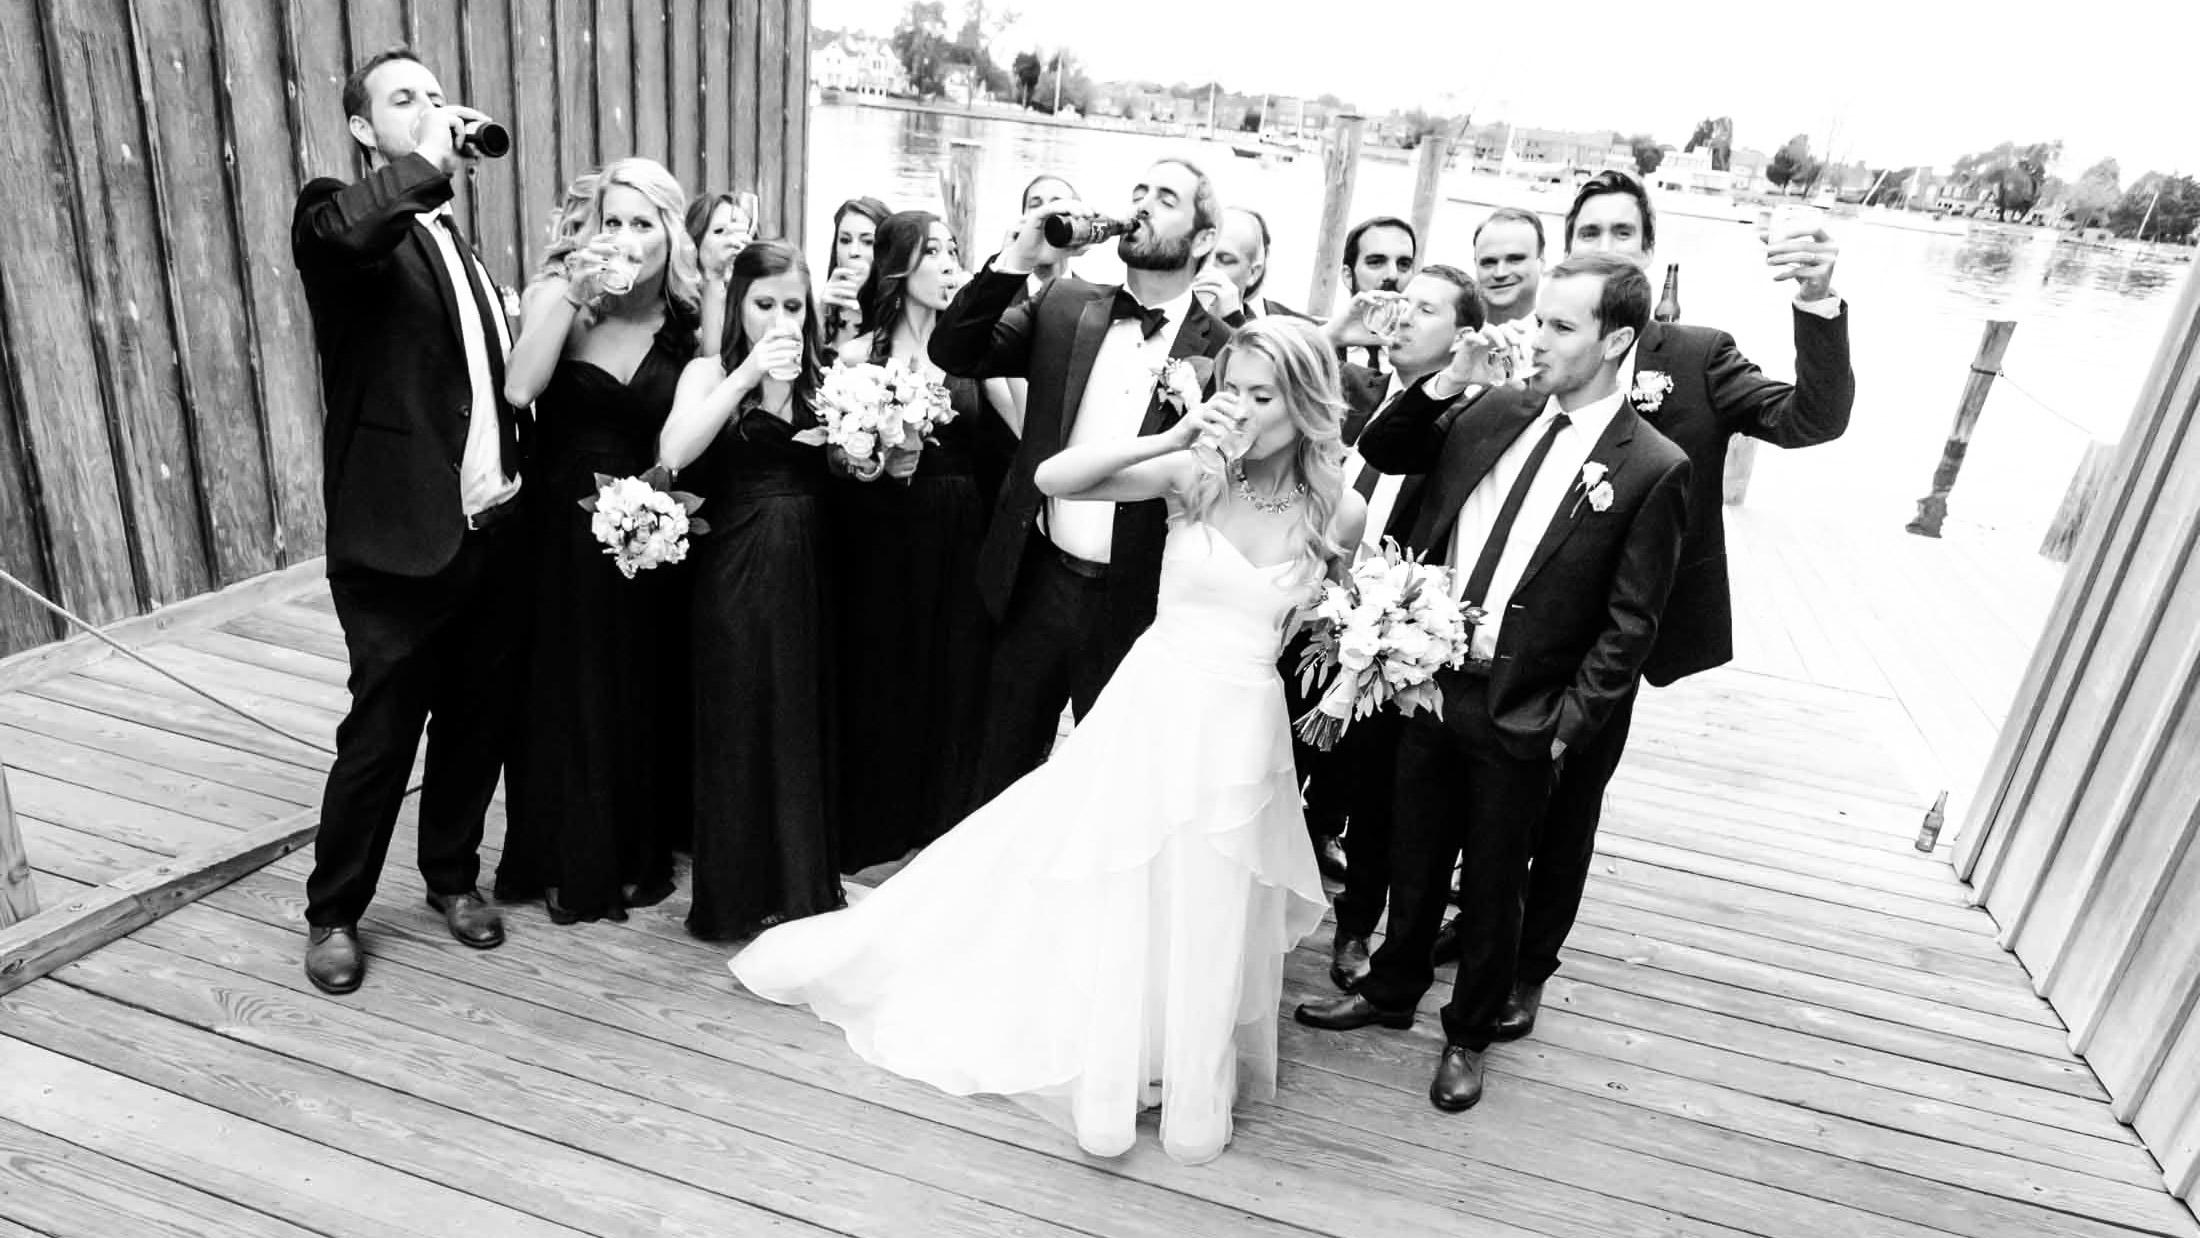 dc+metro+wedding+photographer+vadym+guliuk+photography+wedding+party-2021.jpg